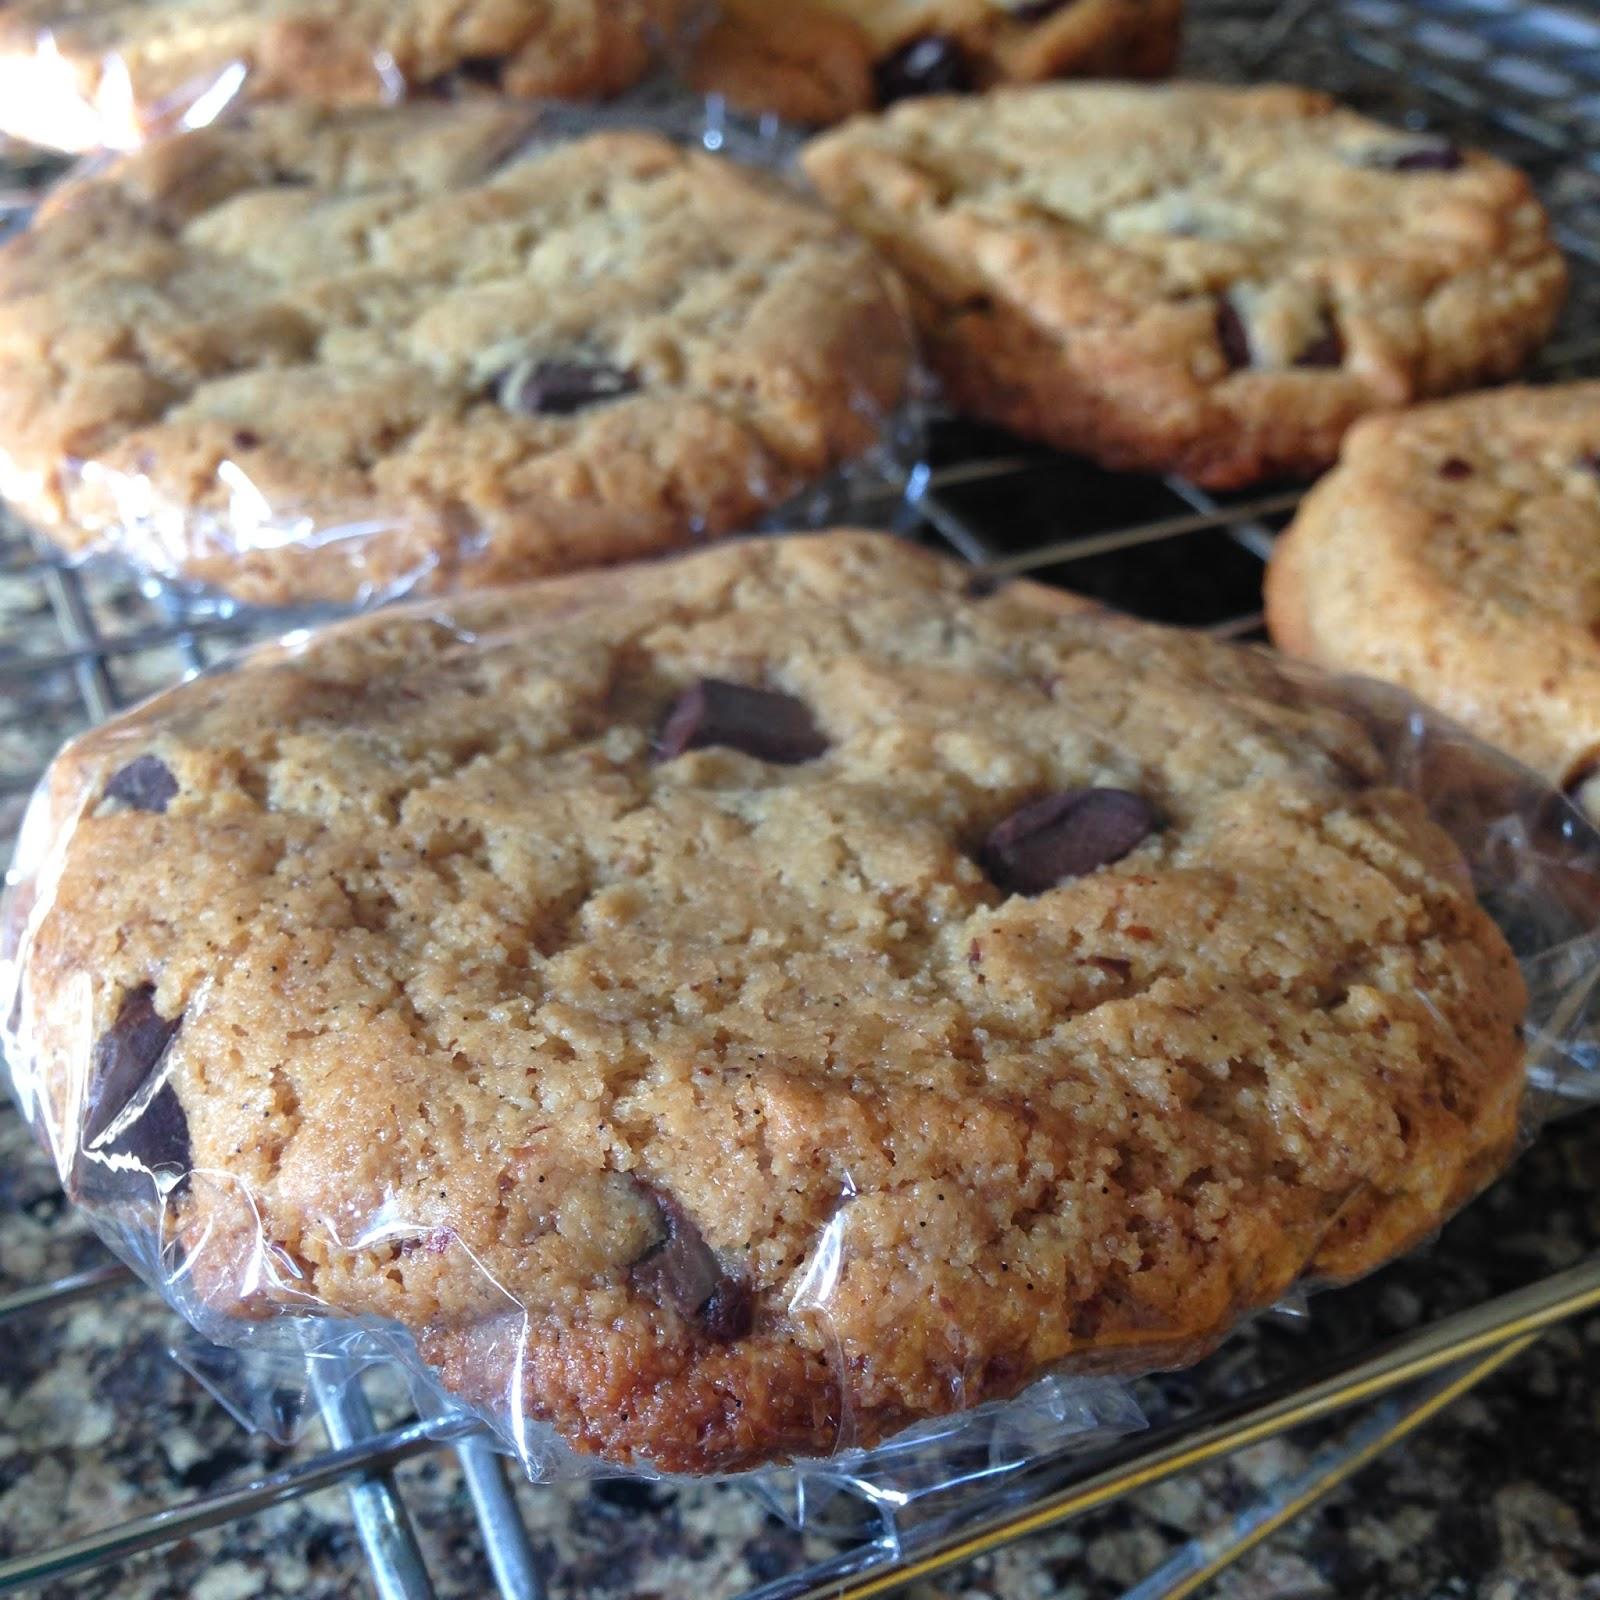 Grain-free egg-free Chocolate Chip Cookie!